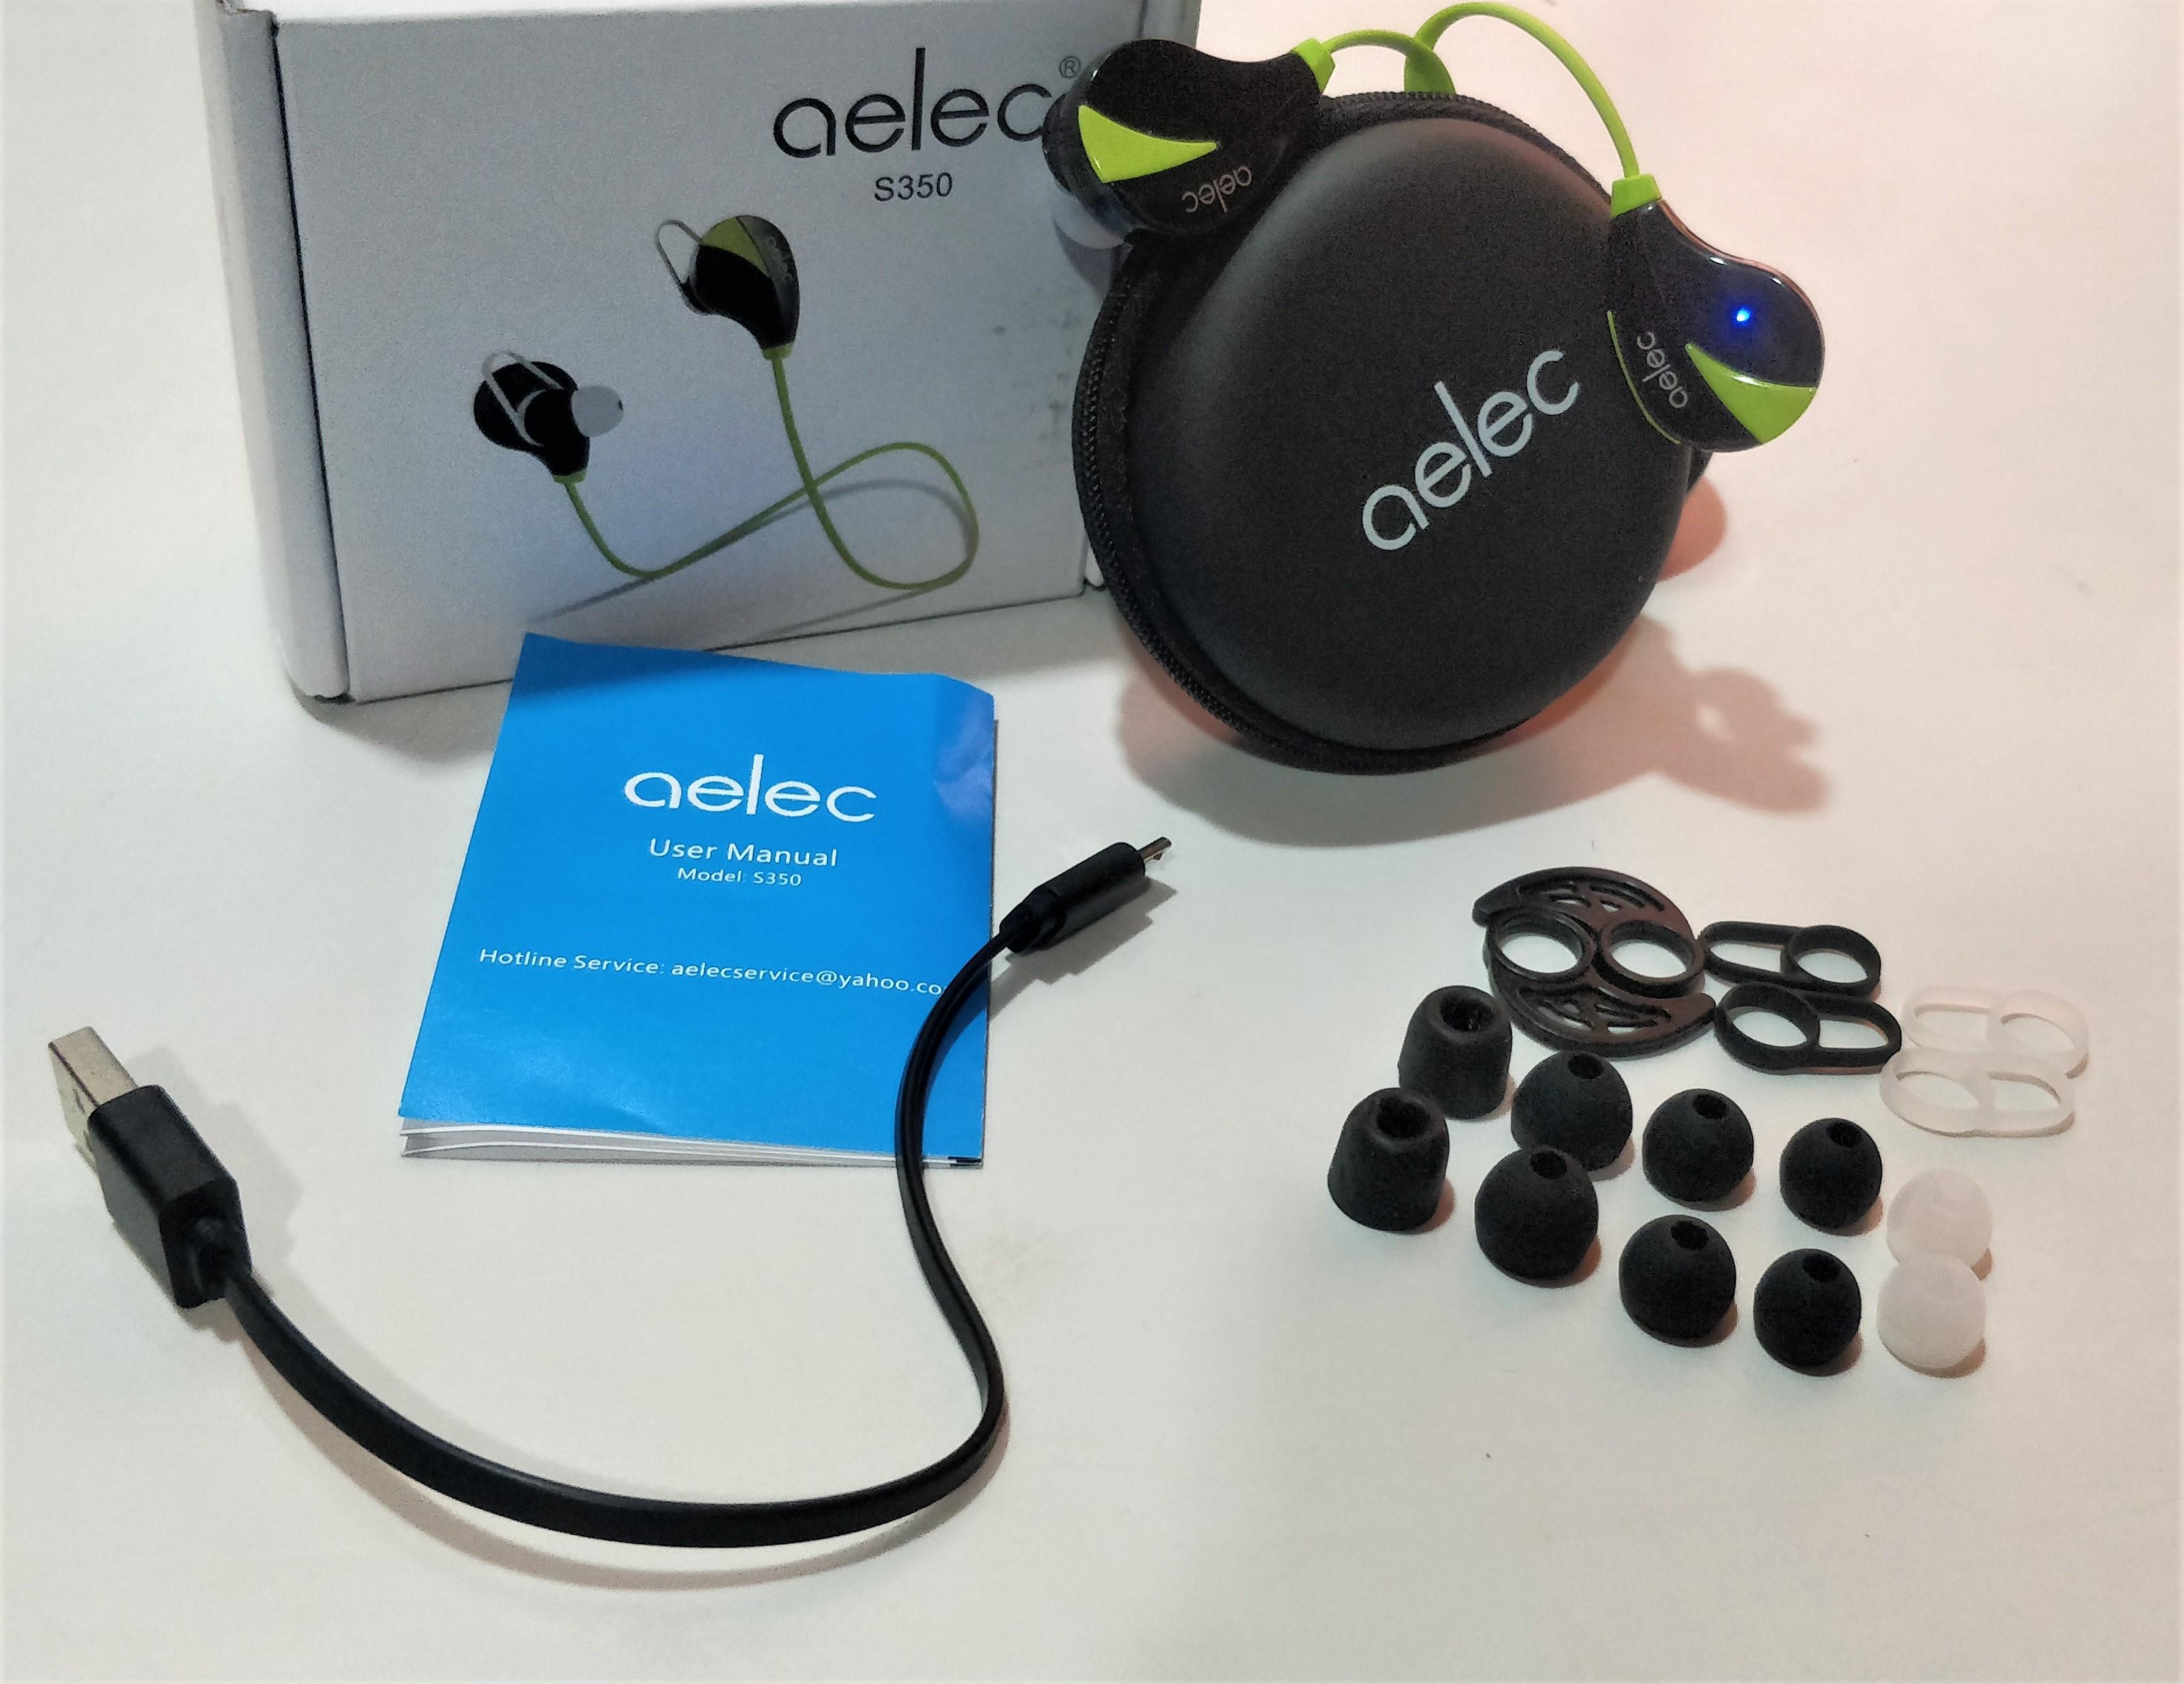 85a36fbd1a8 Review: Aelec S350 Bluetooth Headset | Sweatproof | In-Ear Sports Earbuds